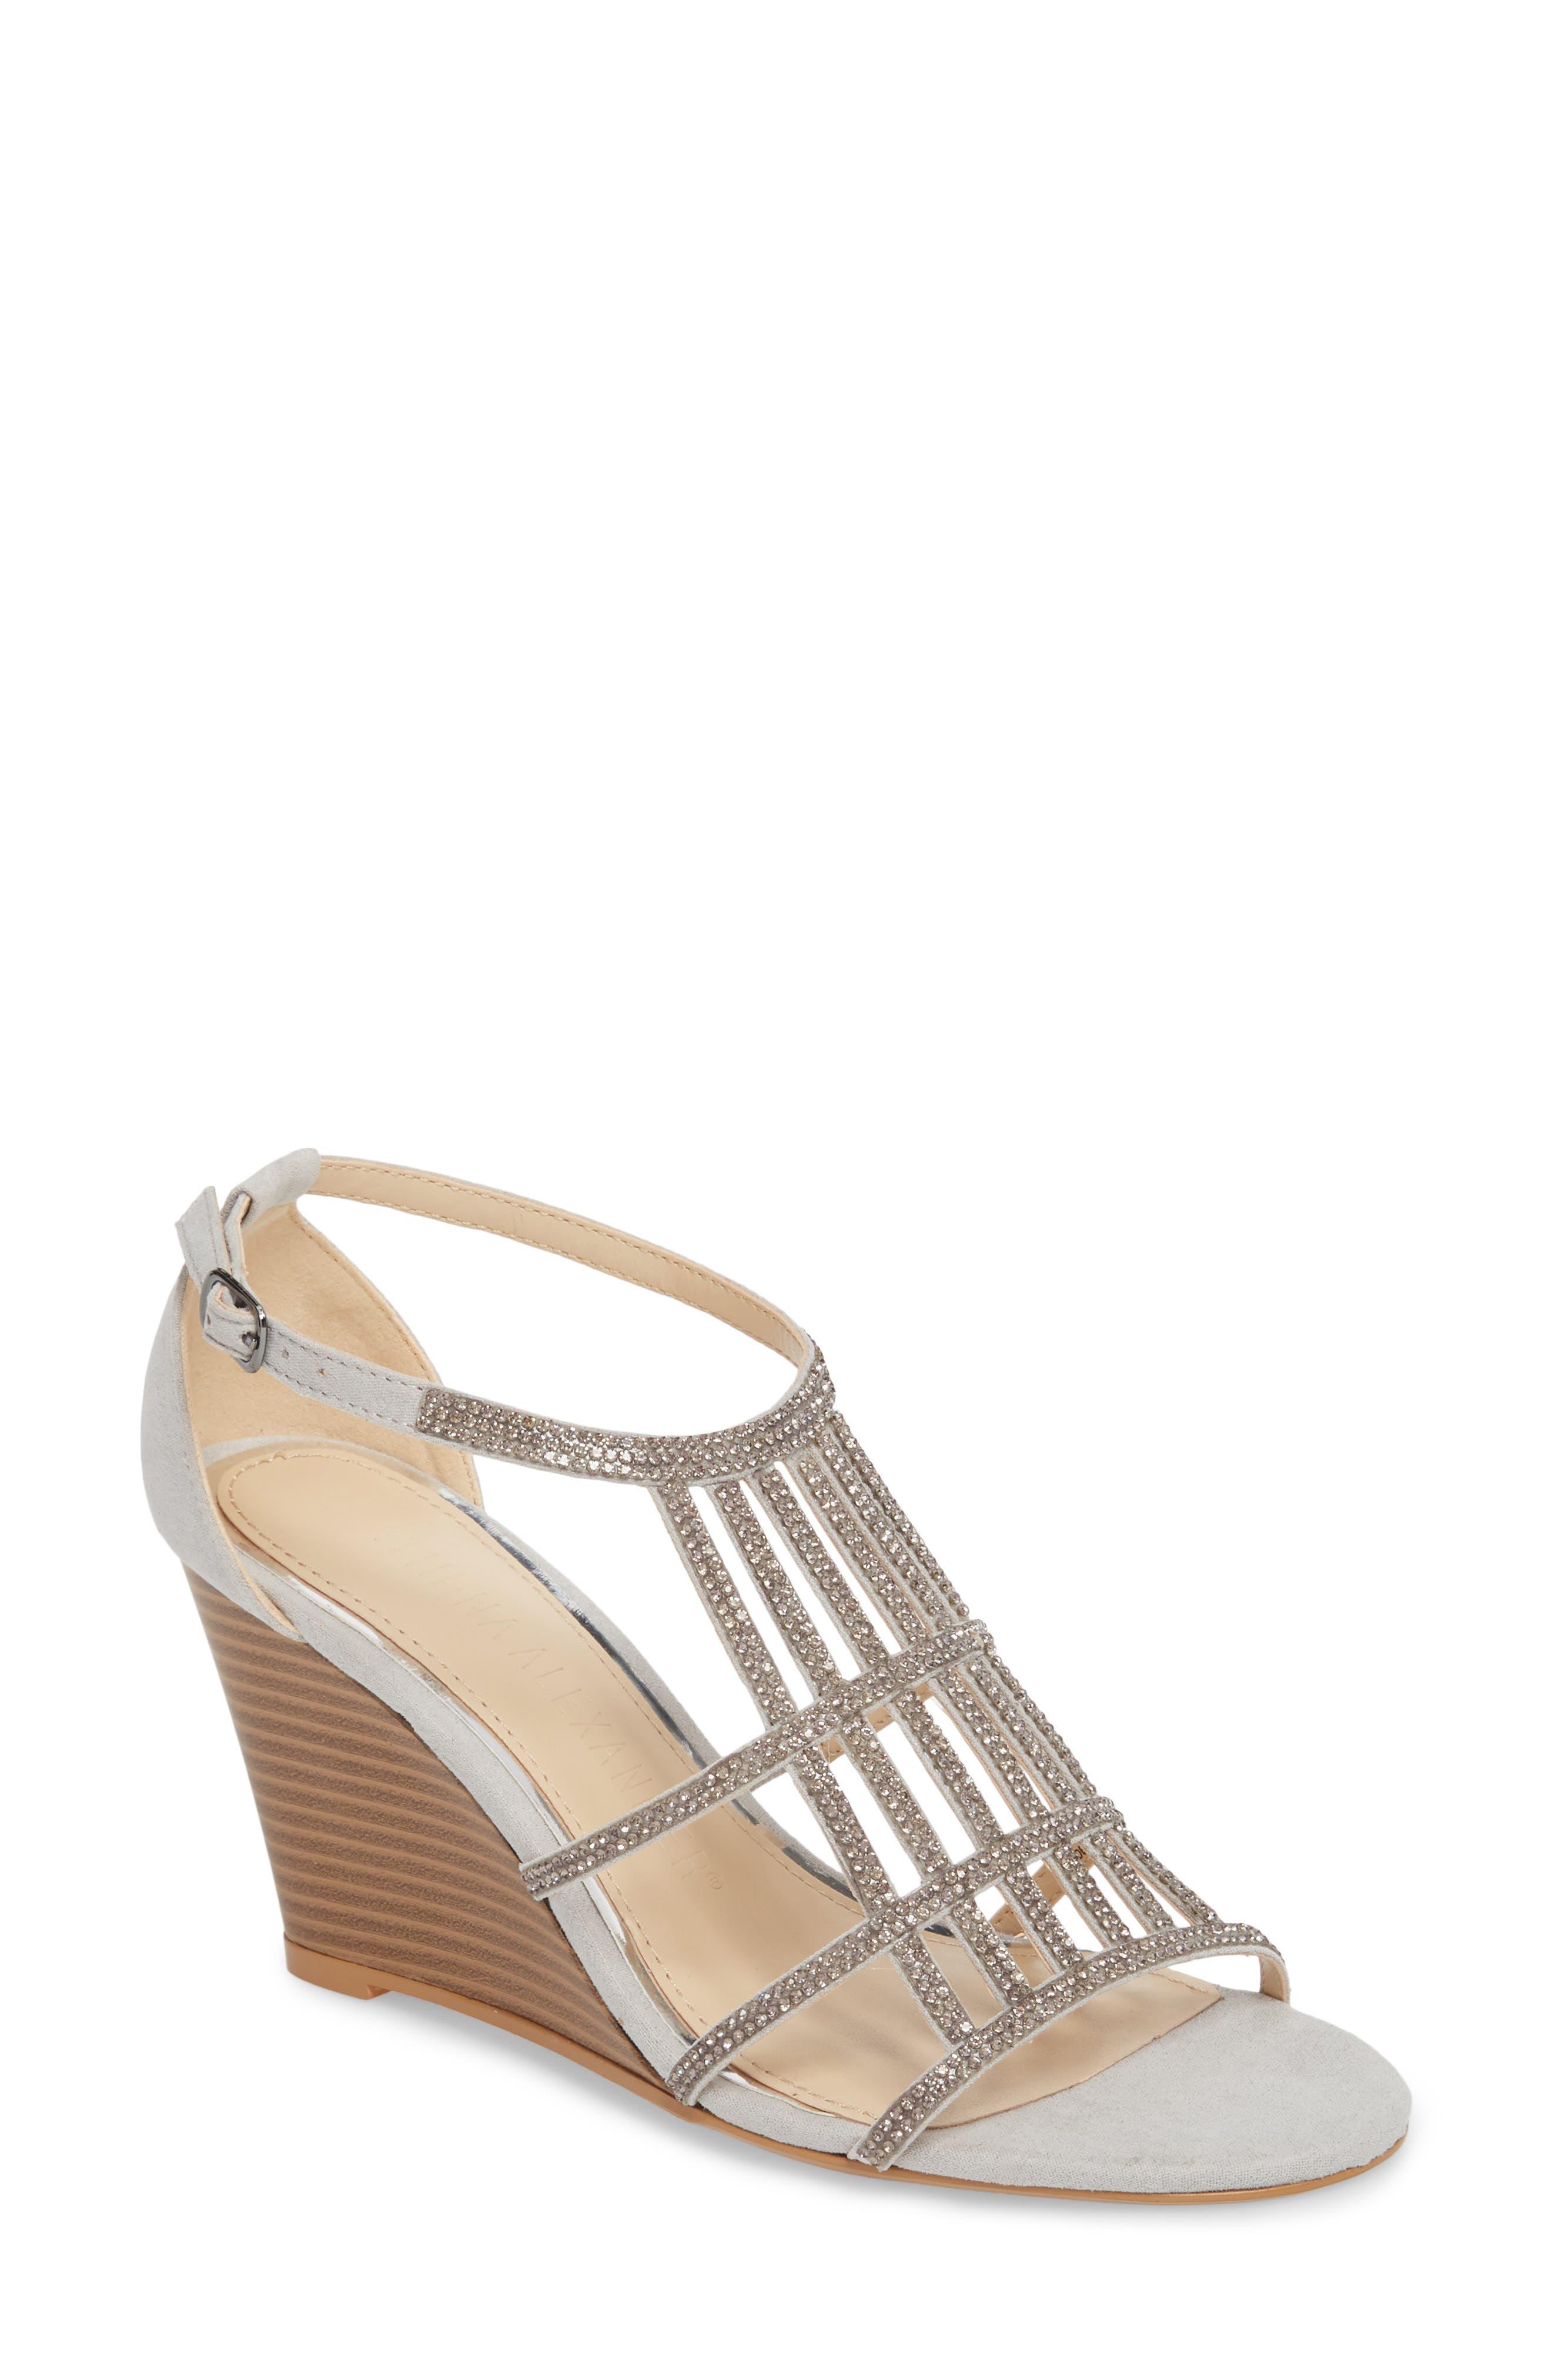 Athena Alexander Hampton Crystal Embellished Wedge Sandal (Women)